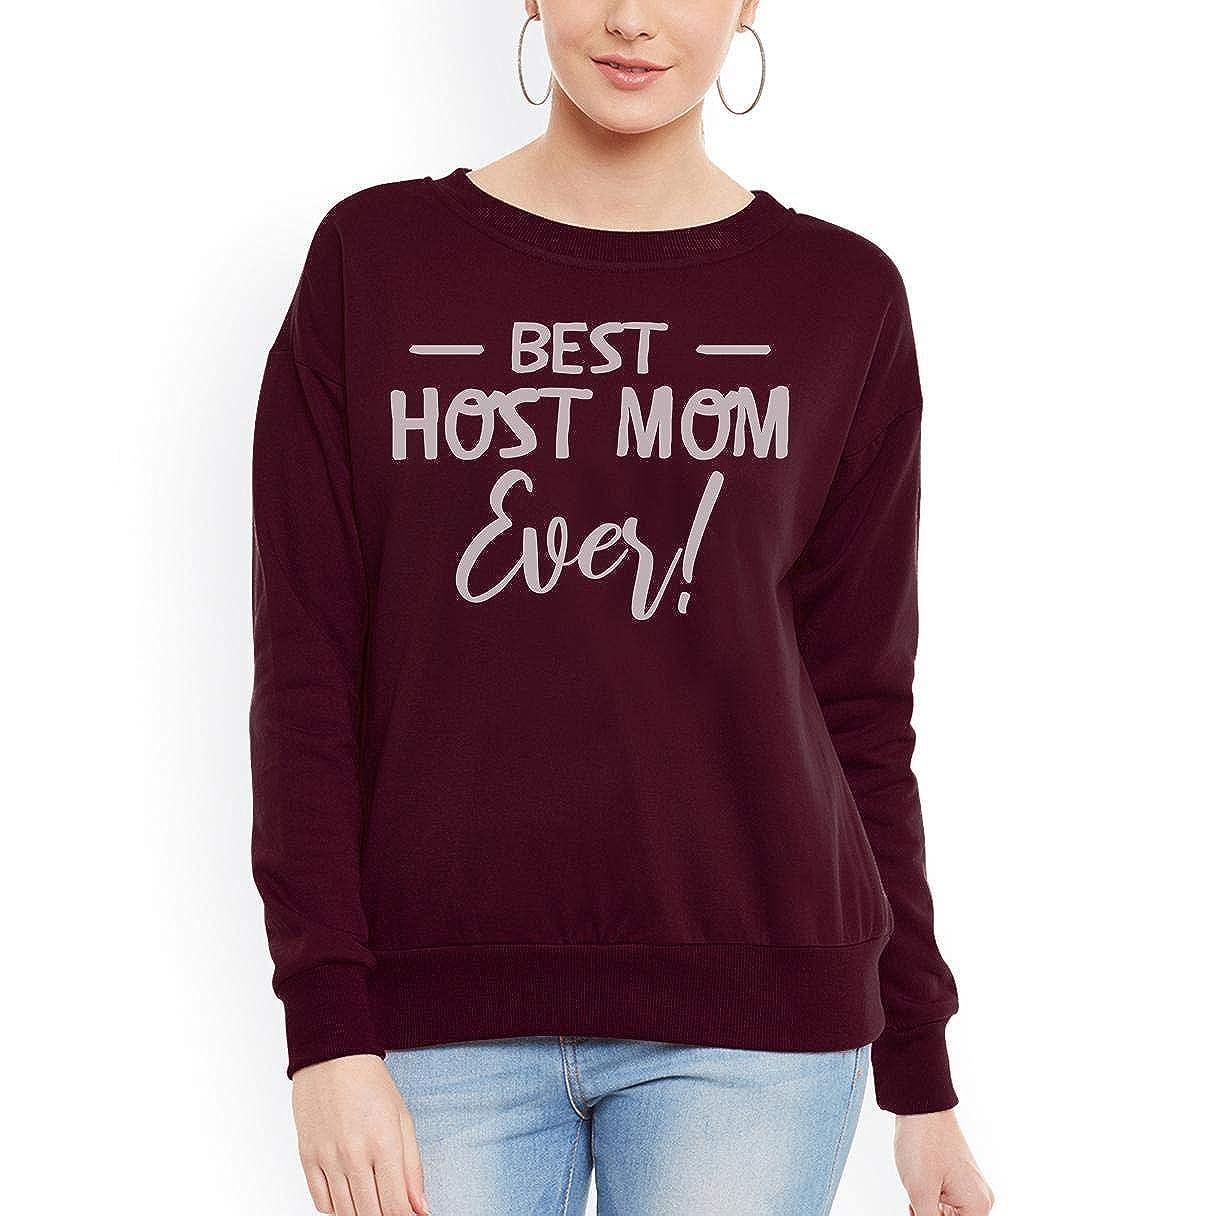 tee Doryti Best Host Mom Ever Women Sweatshirt